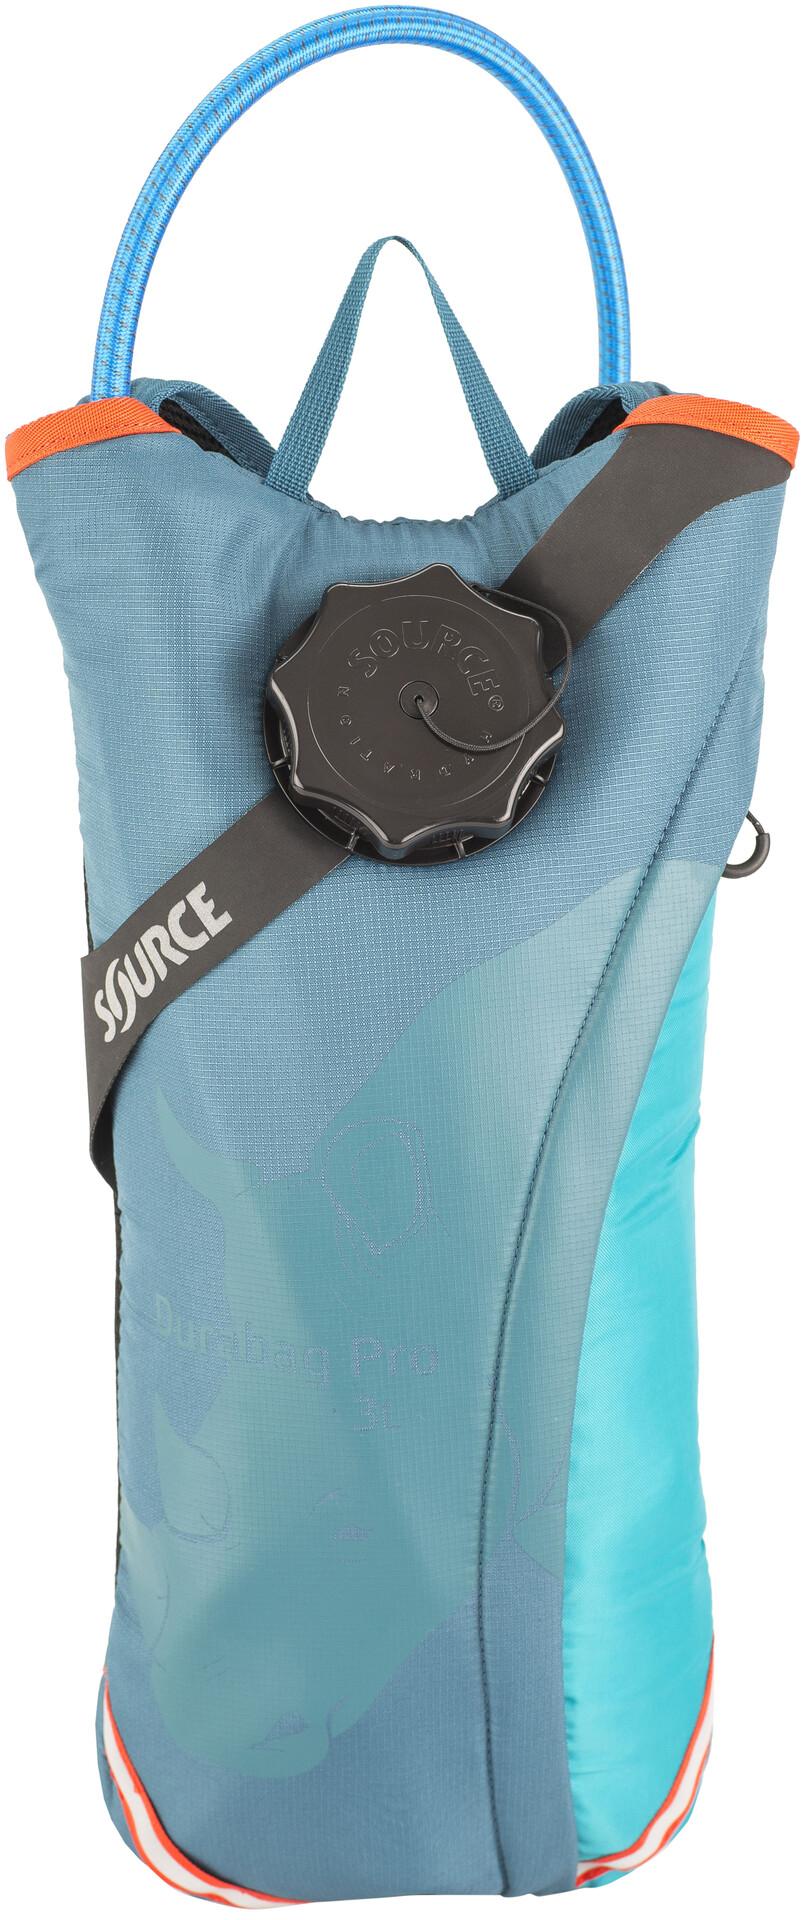 Pro Durabag MediumCoral Source Hydration Pack Blue 35RjL4Aq